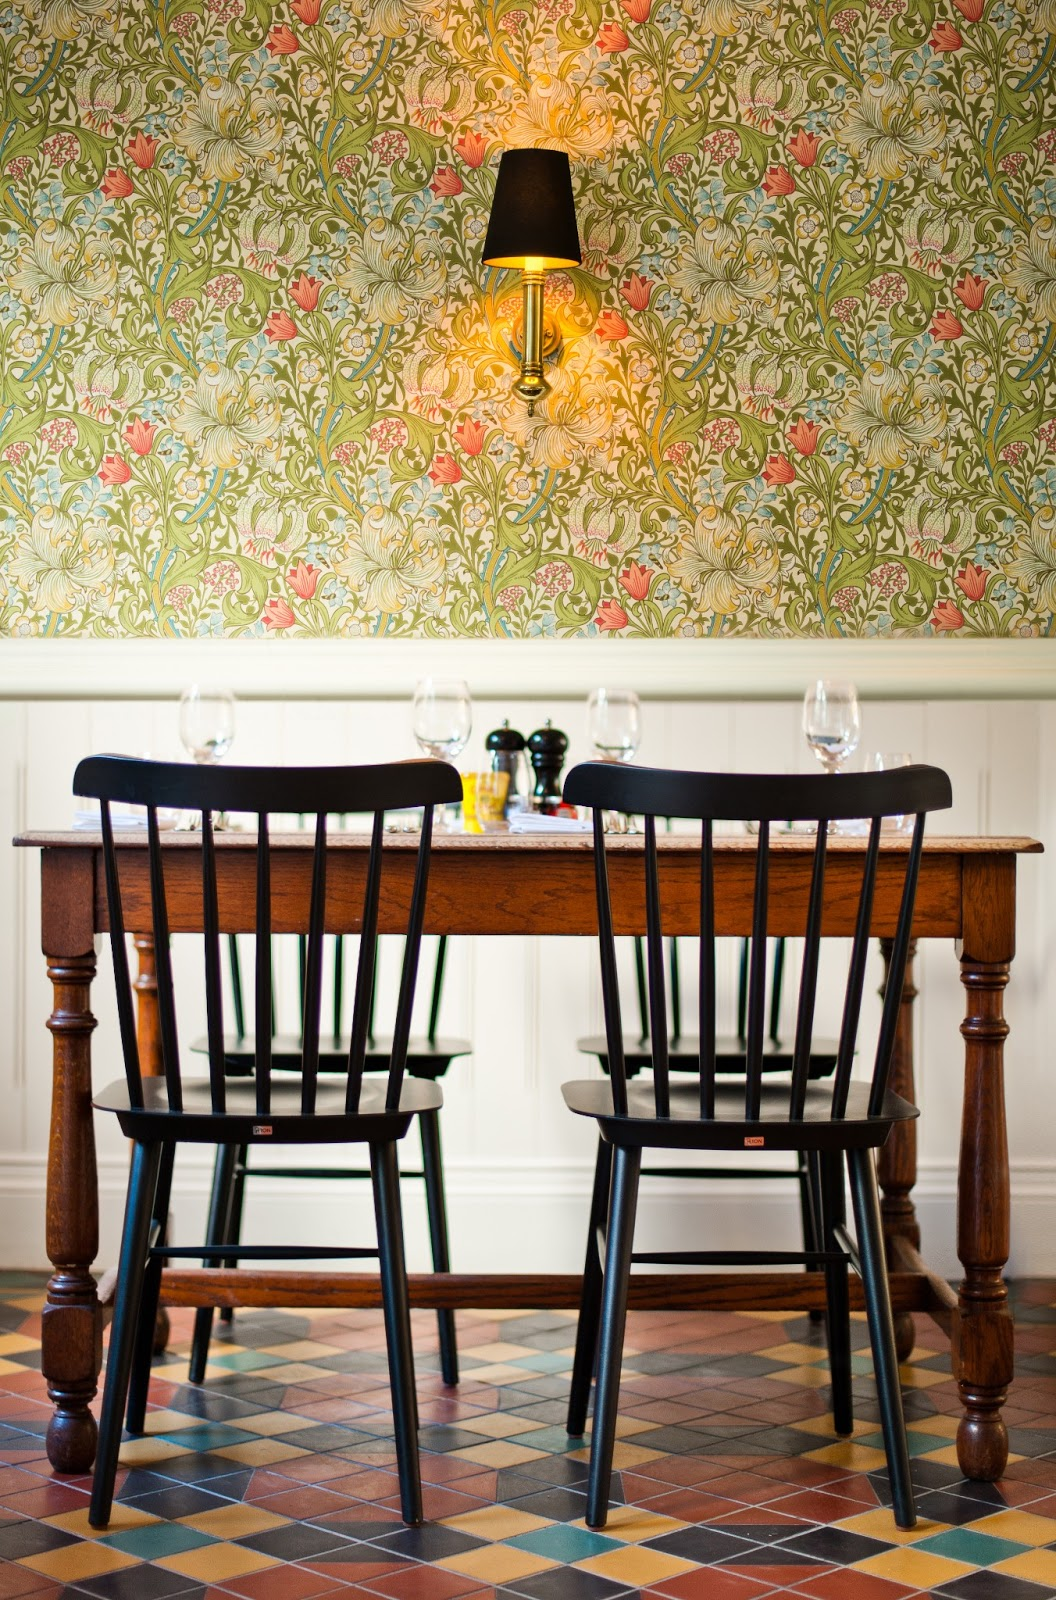 Interiors by alexander waterworth interiors malt house